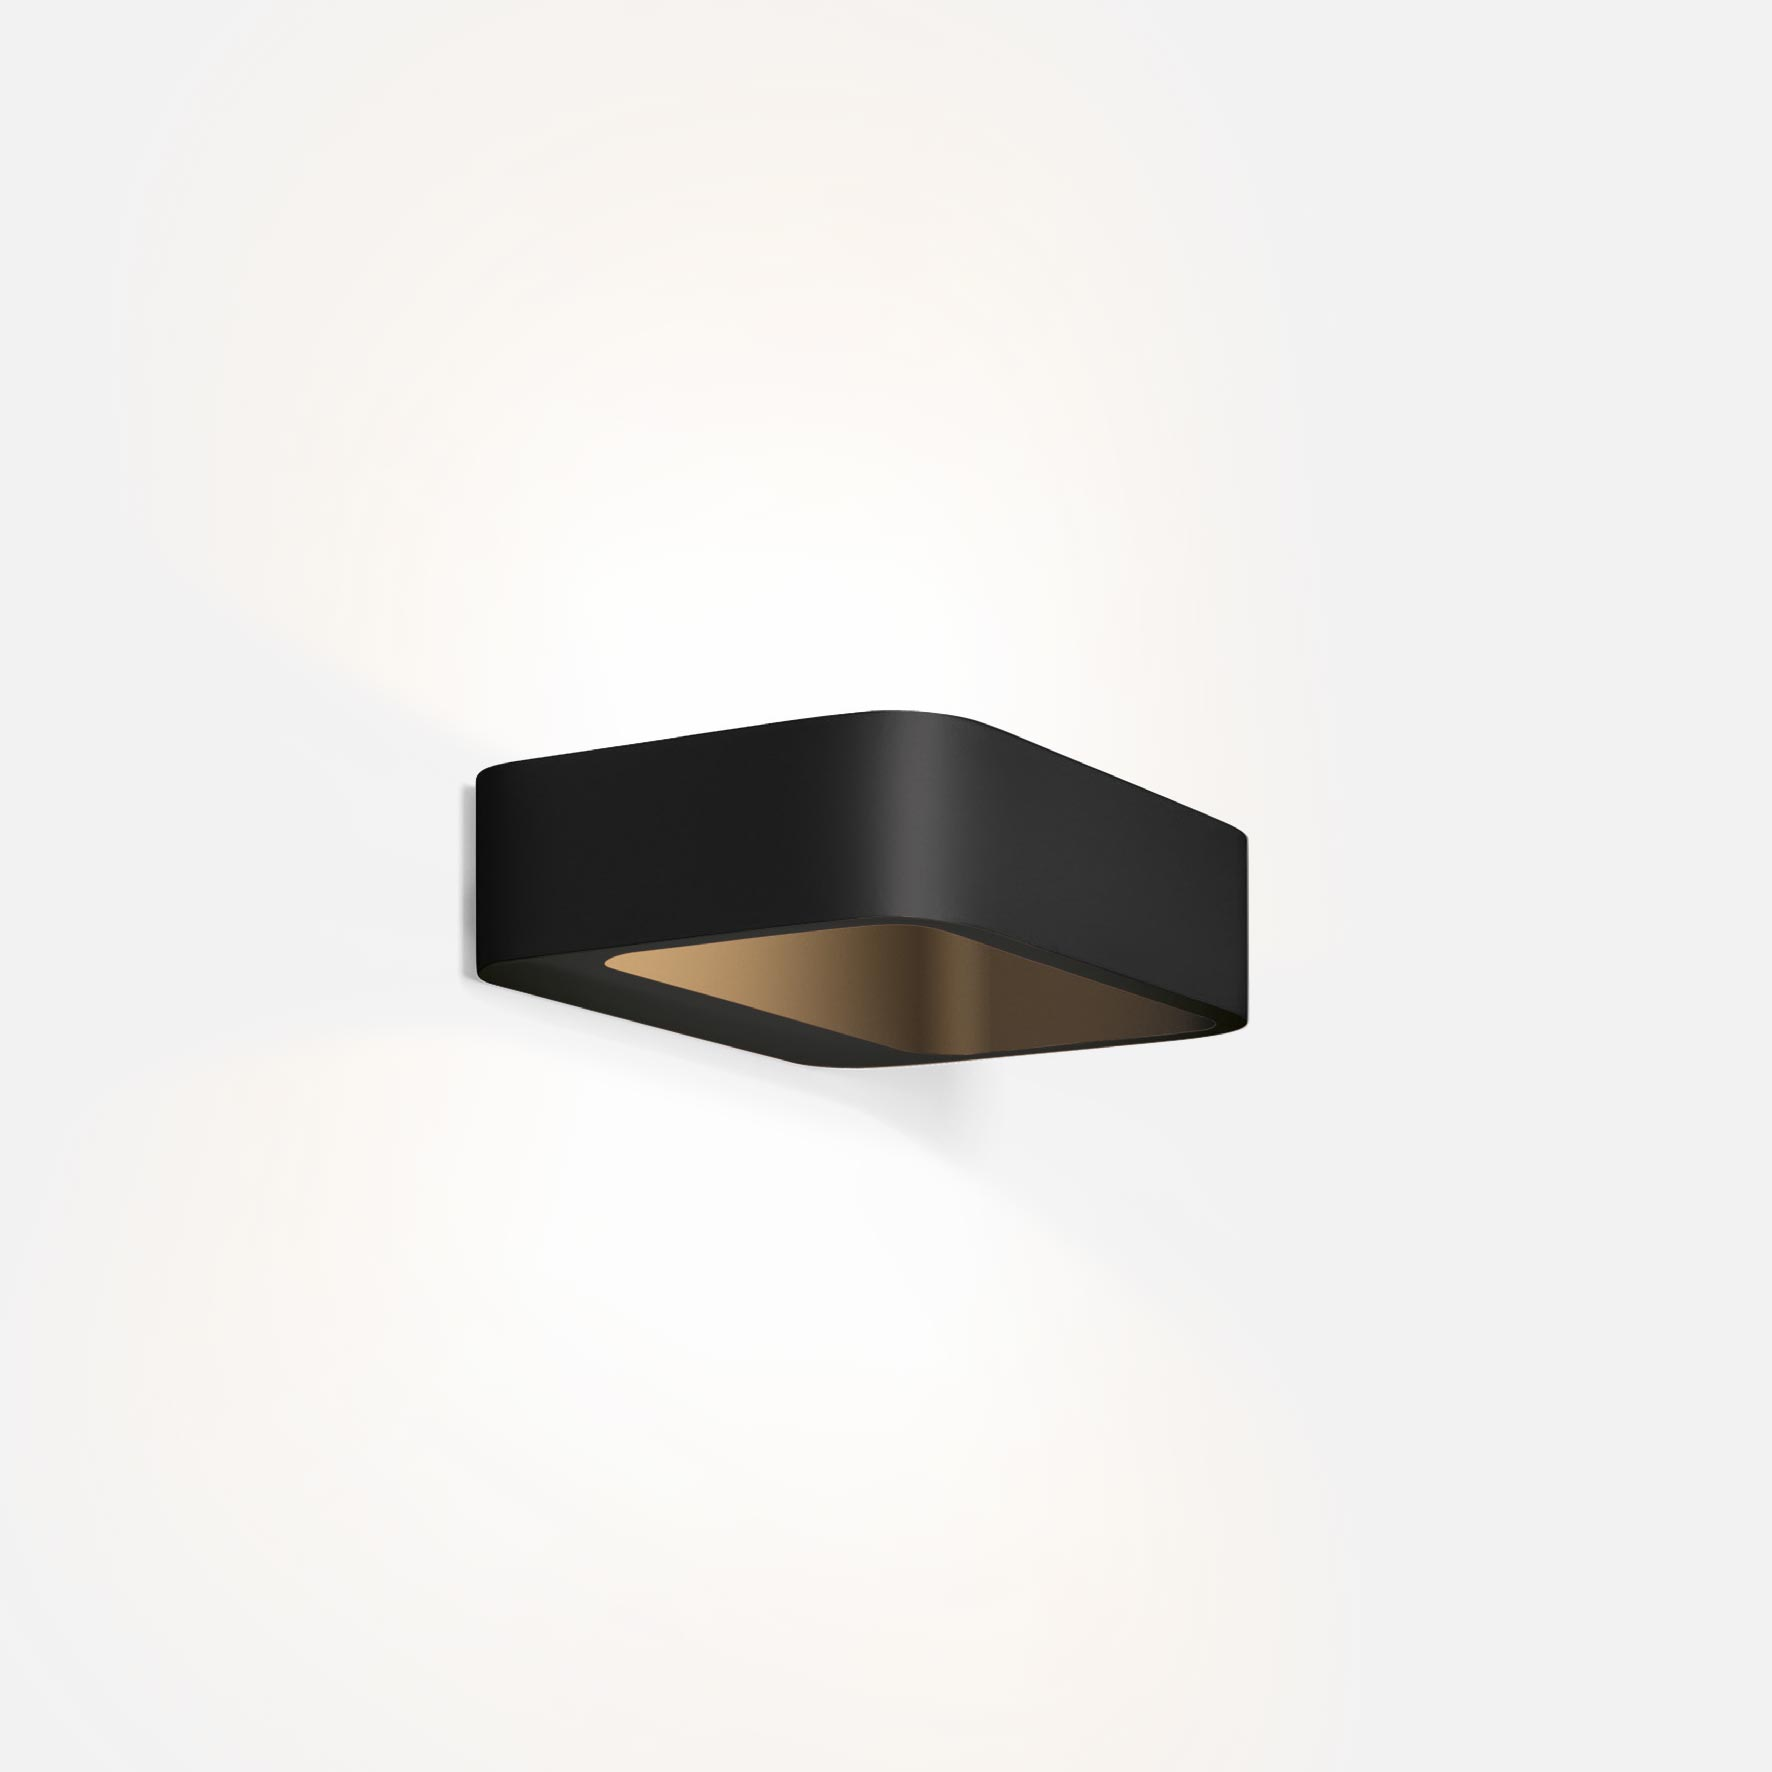 Benta 1.3 black texture